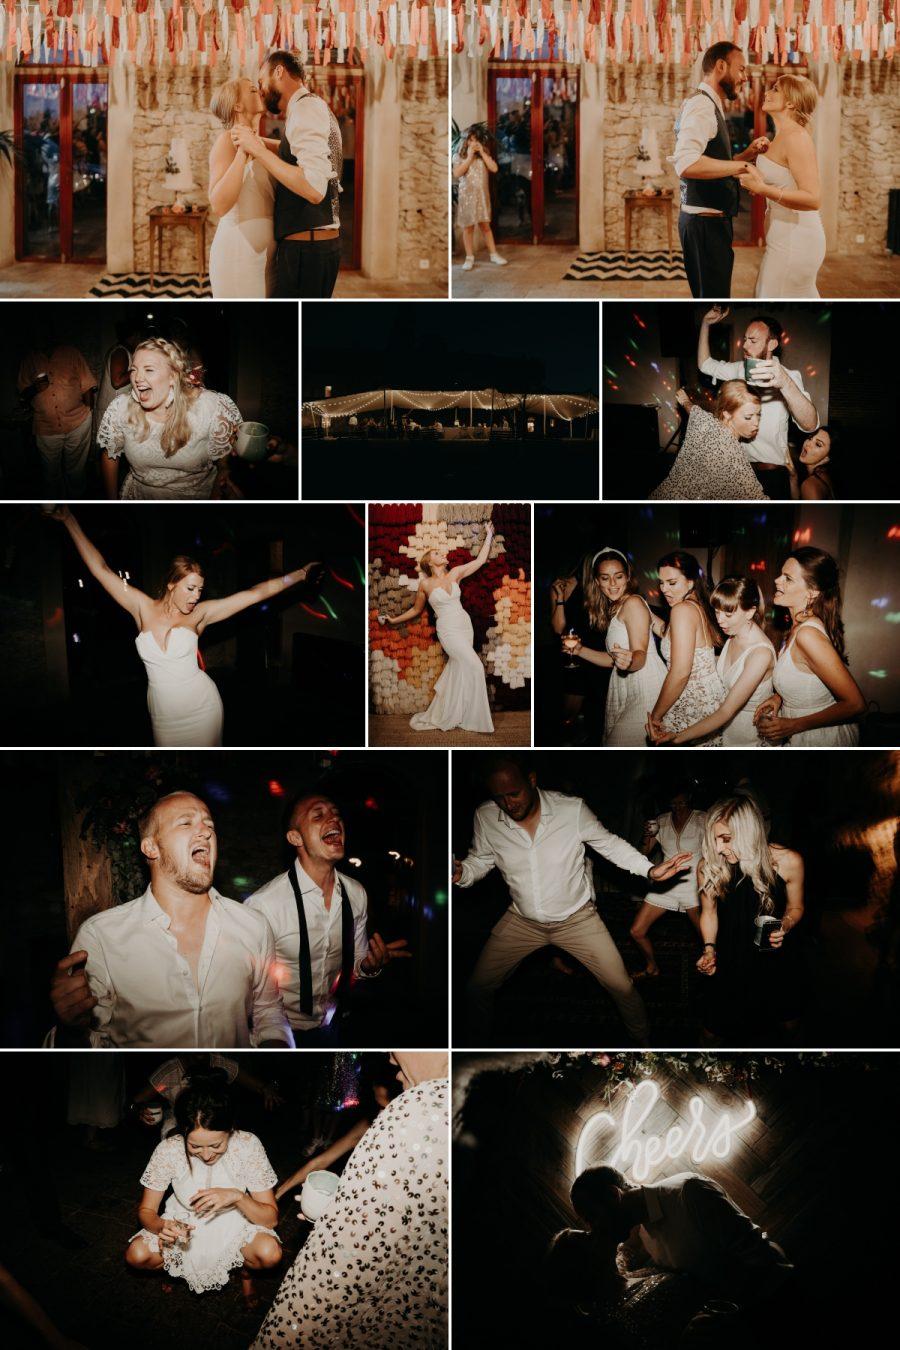 Fajac Toulouse wedding party